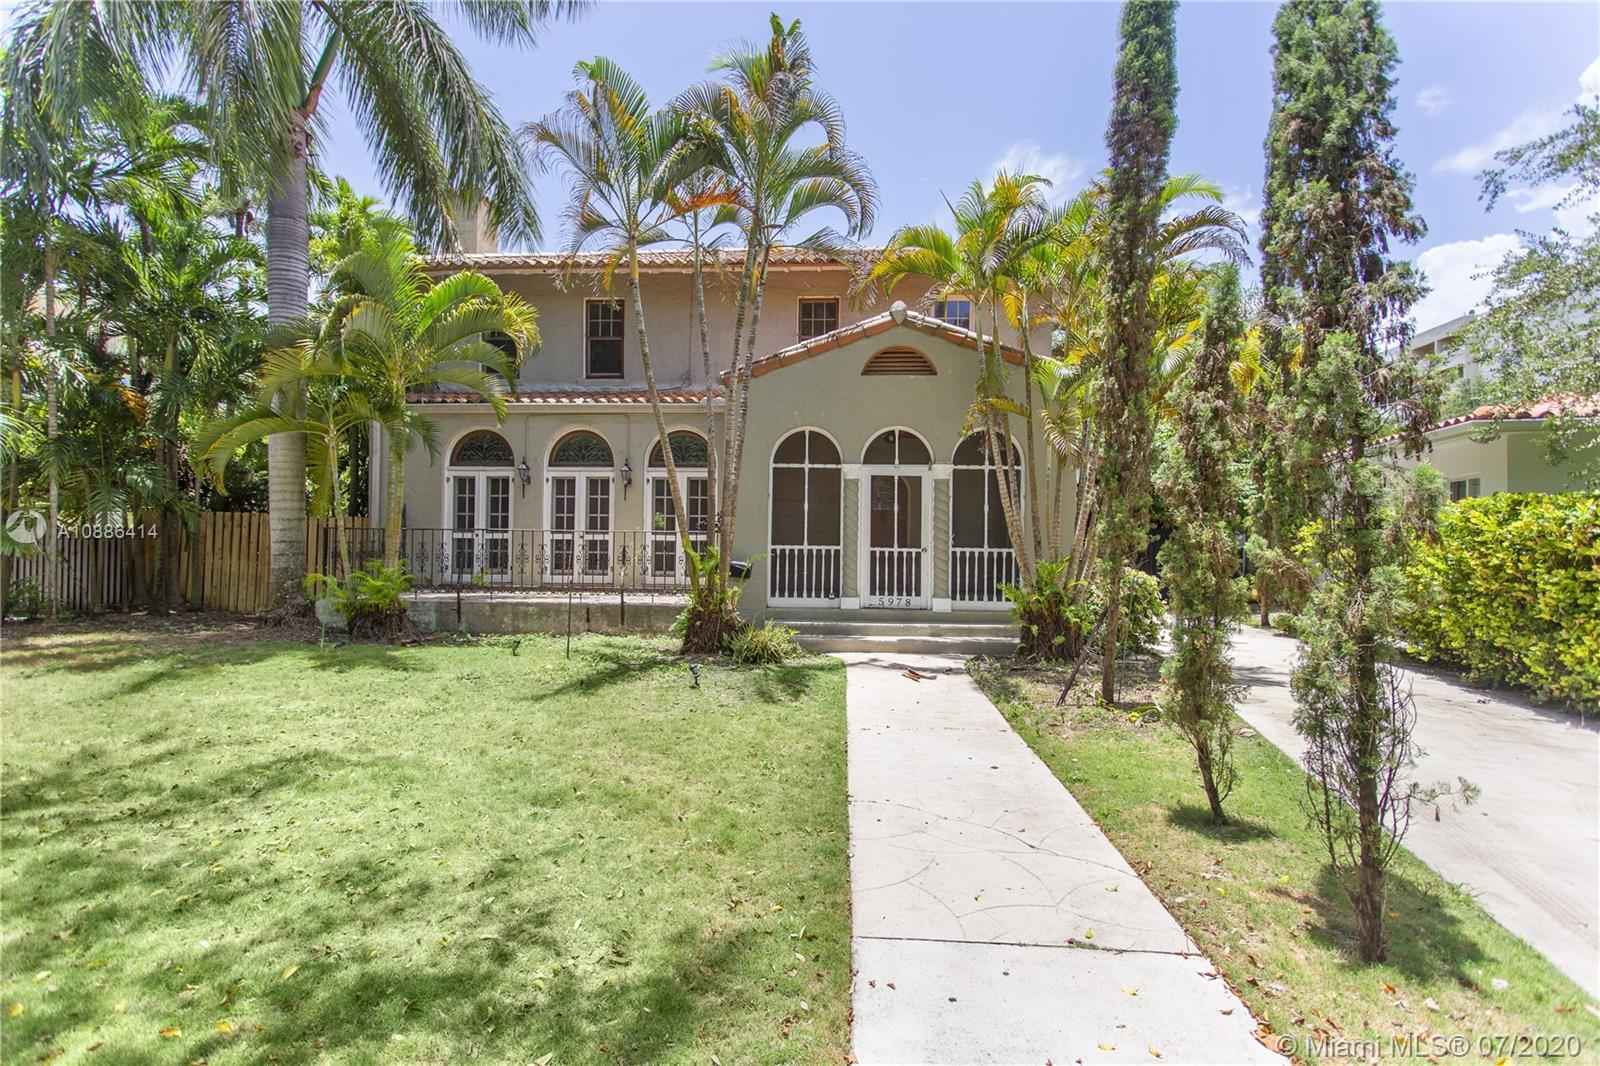 Morningside - 5978 NE 6th Ct, Miami, FL 33137